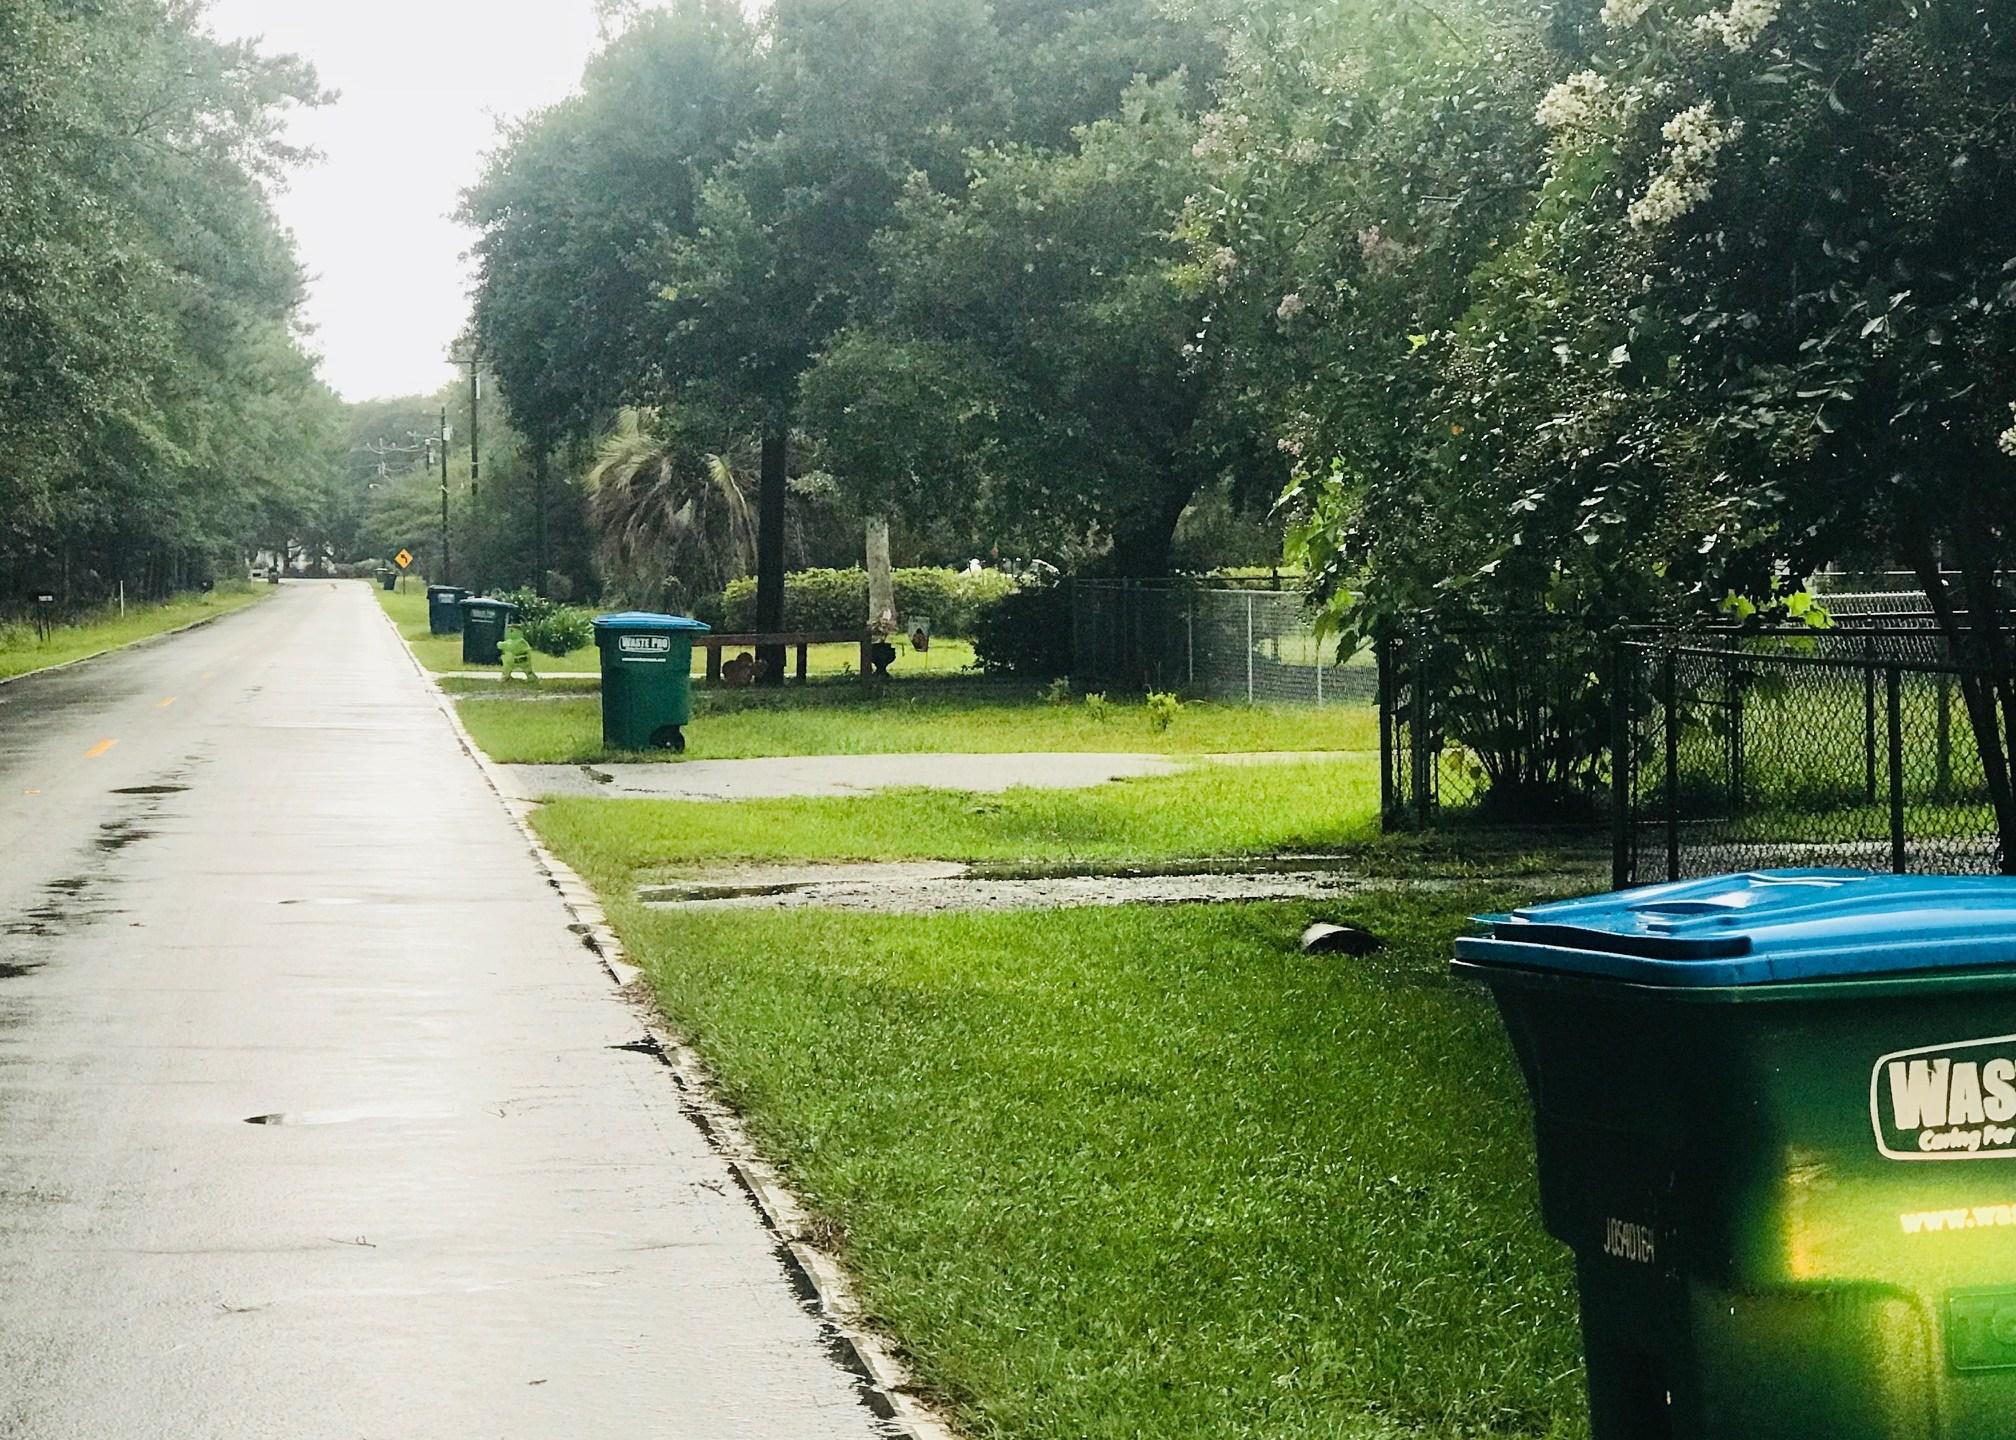 Johns Island trash bins linger